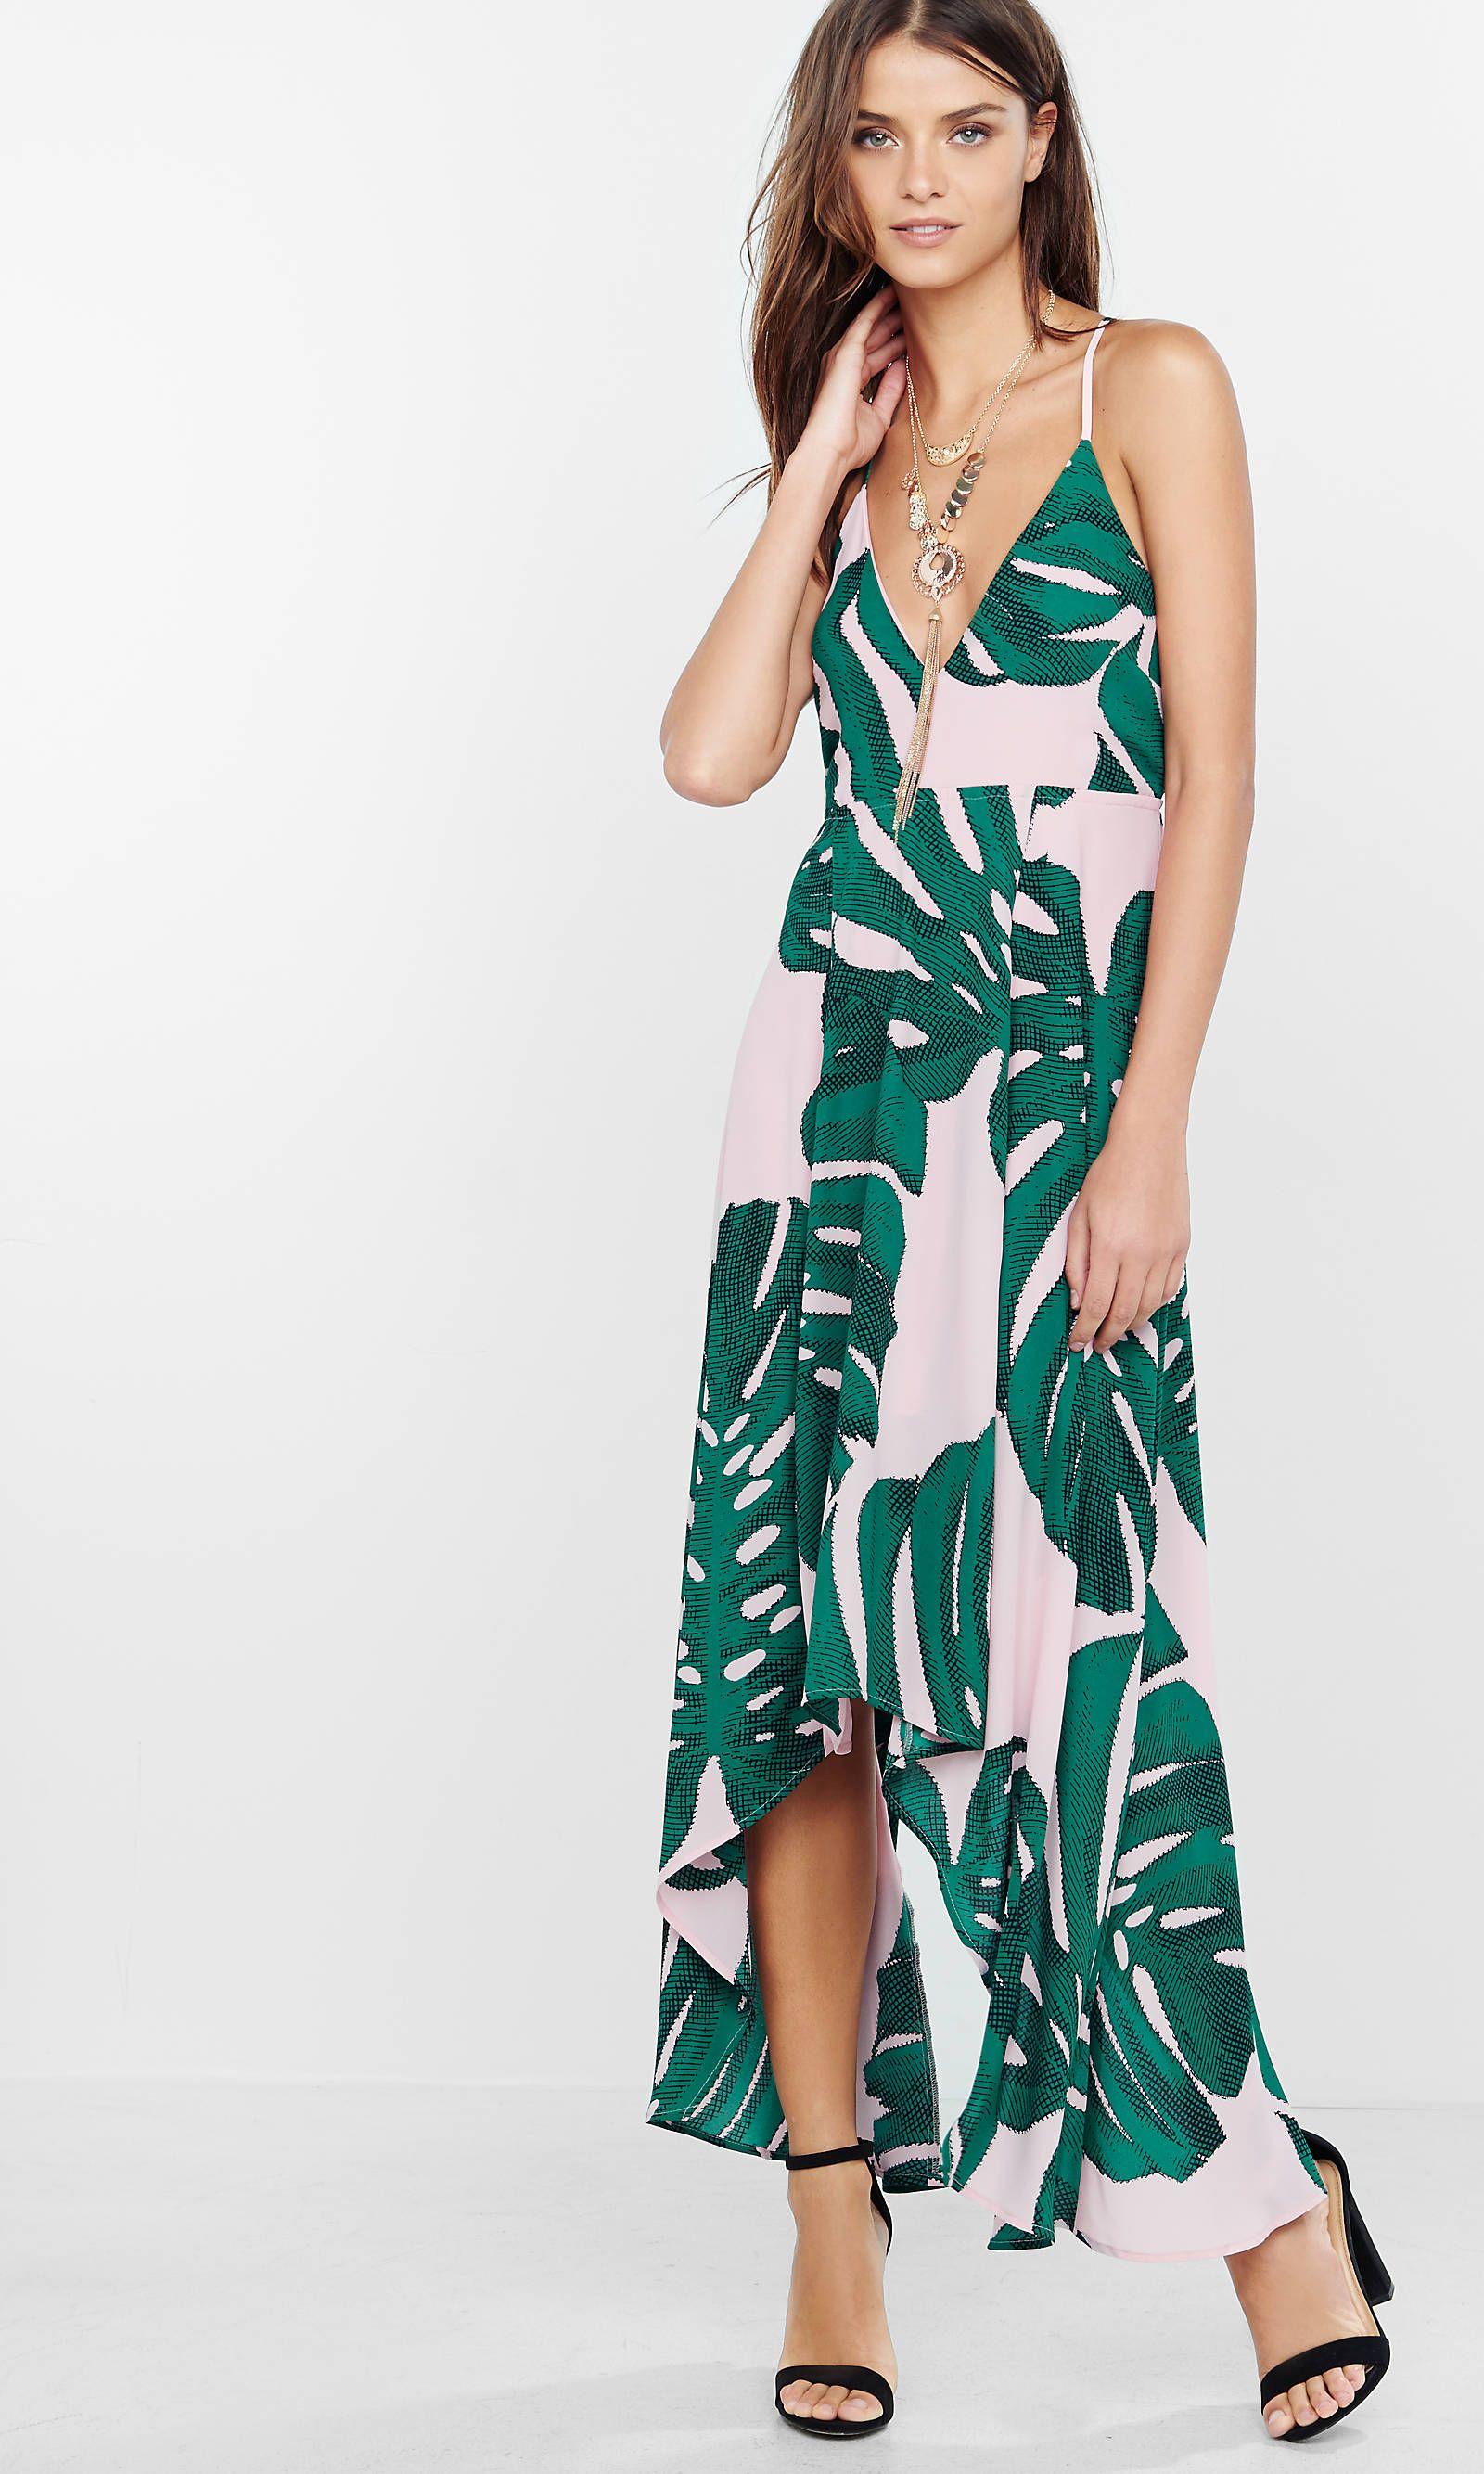 The dress express - Palm Leaf Print Maxi Sundress From Express